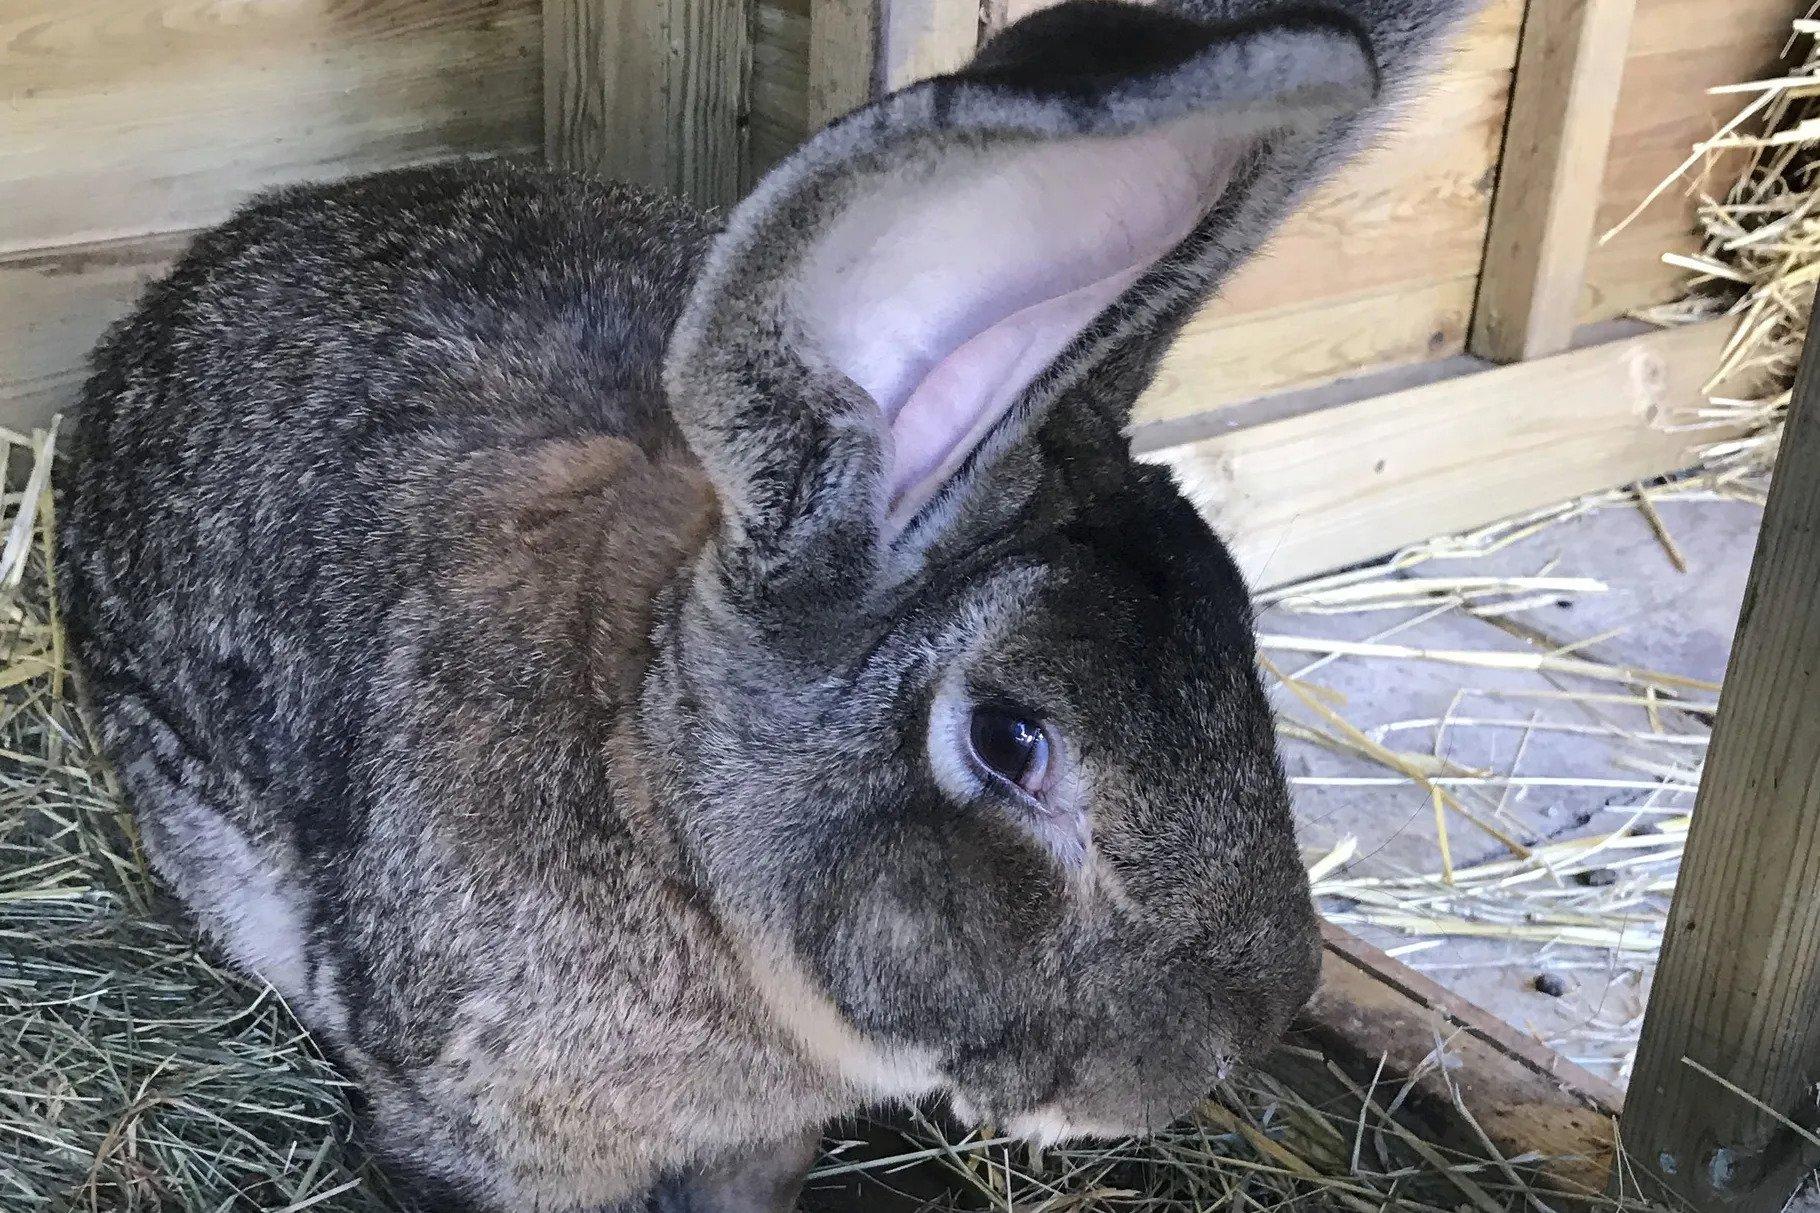 Darius, The World's Longest Bunny, Has Gone Missing!